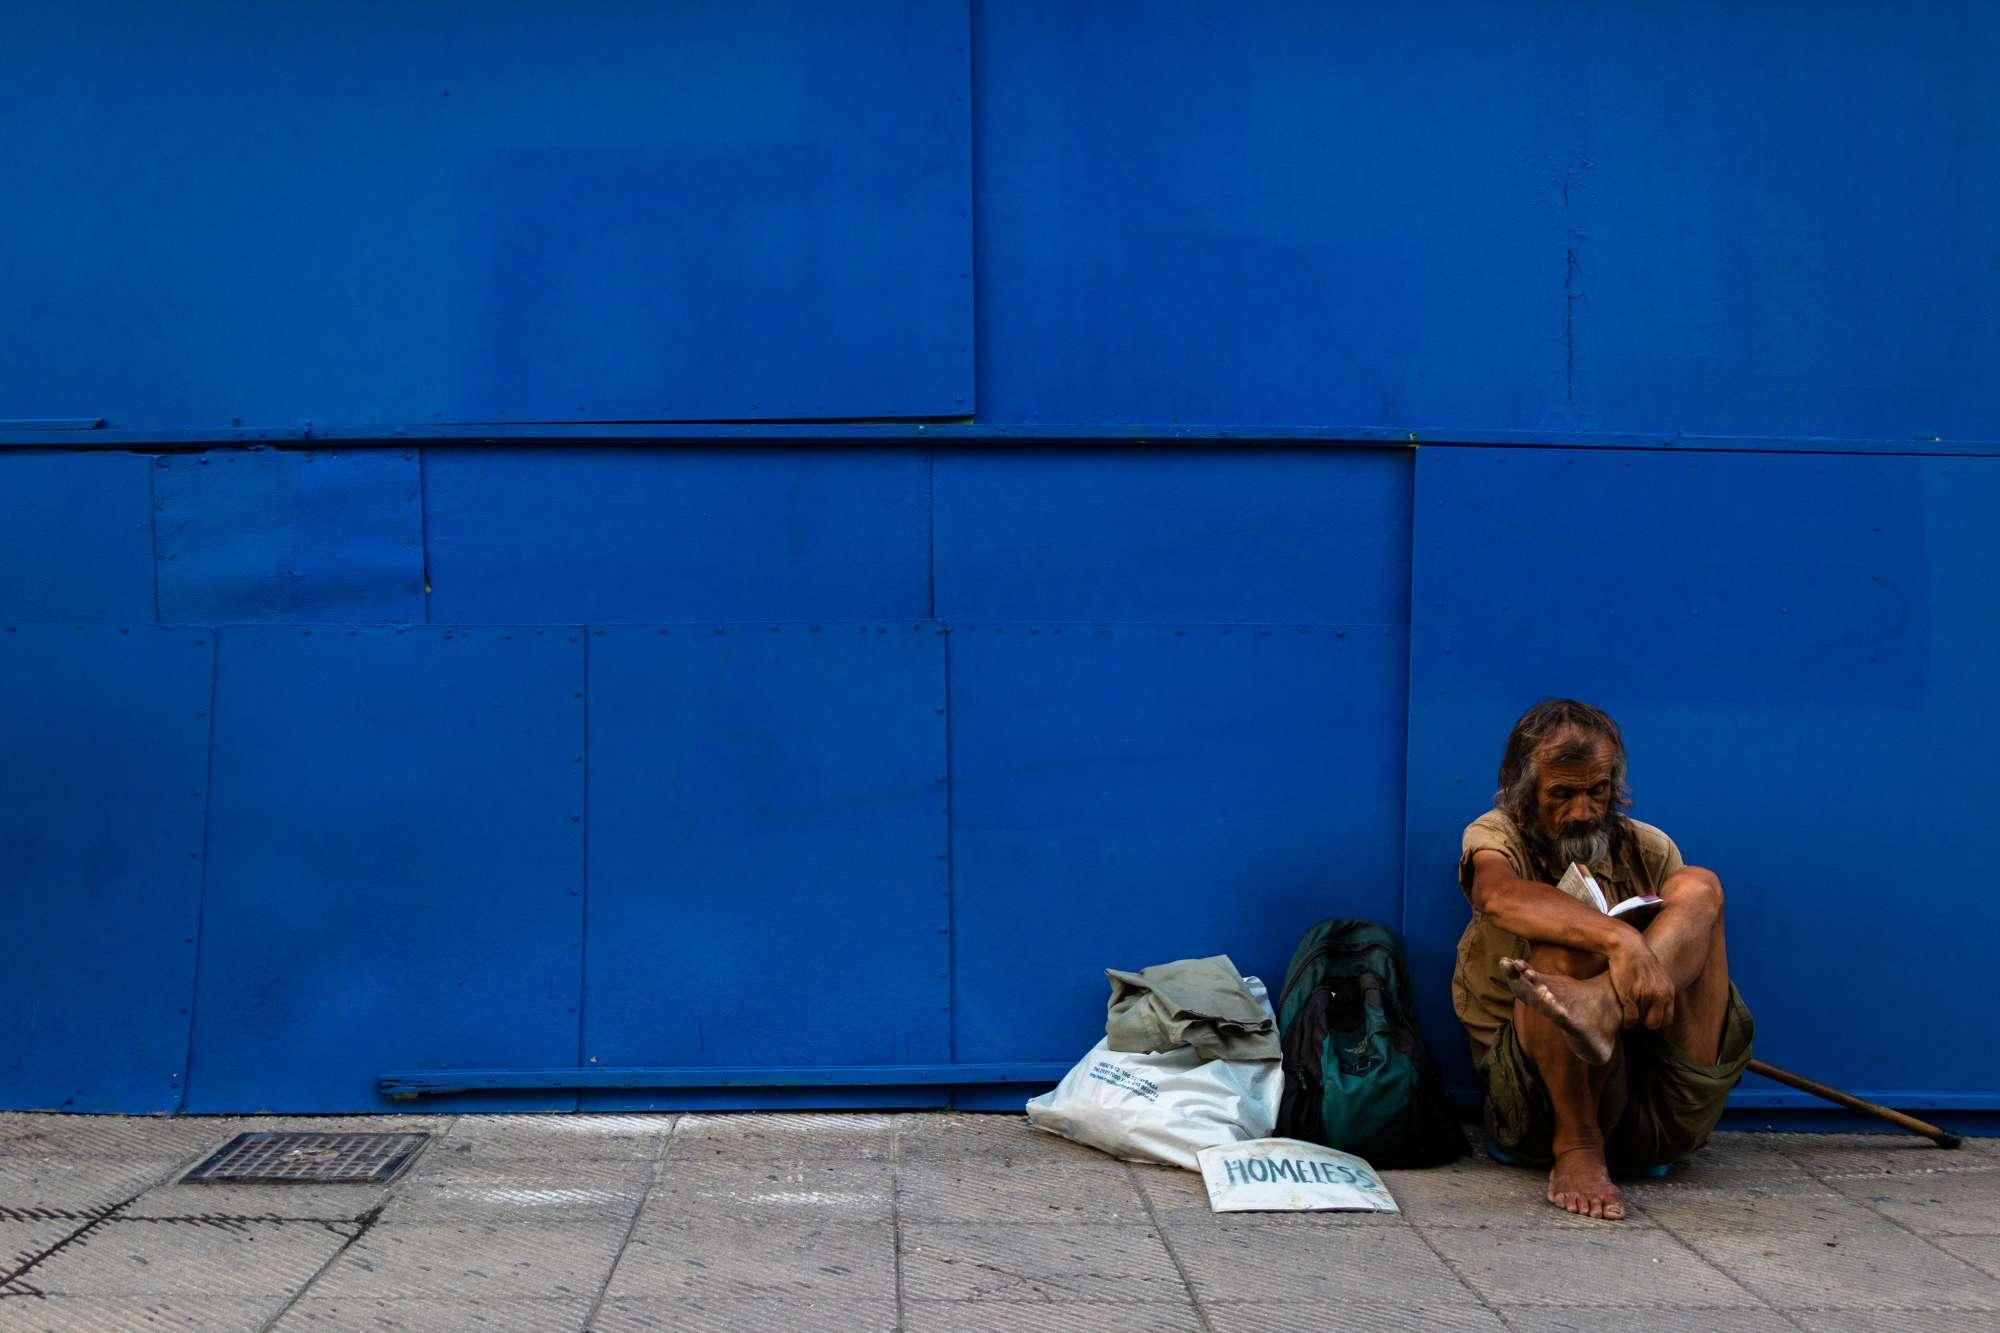 Homeless man sitting on blue wall